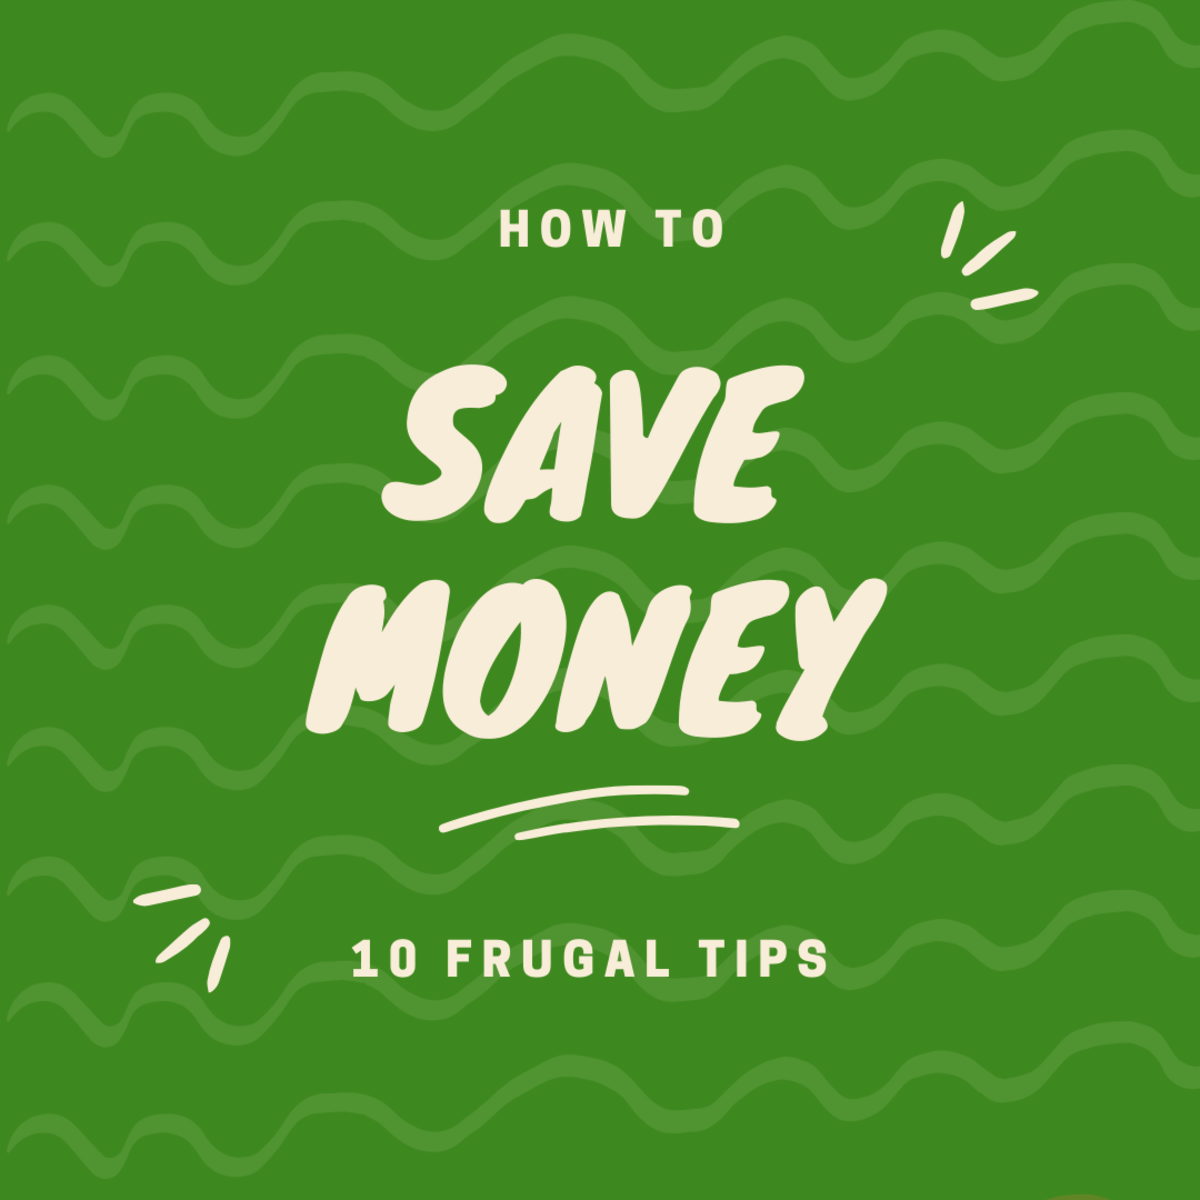 live simple to start saving!